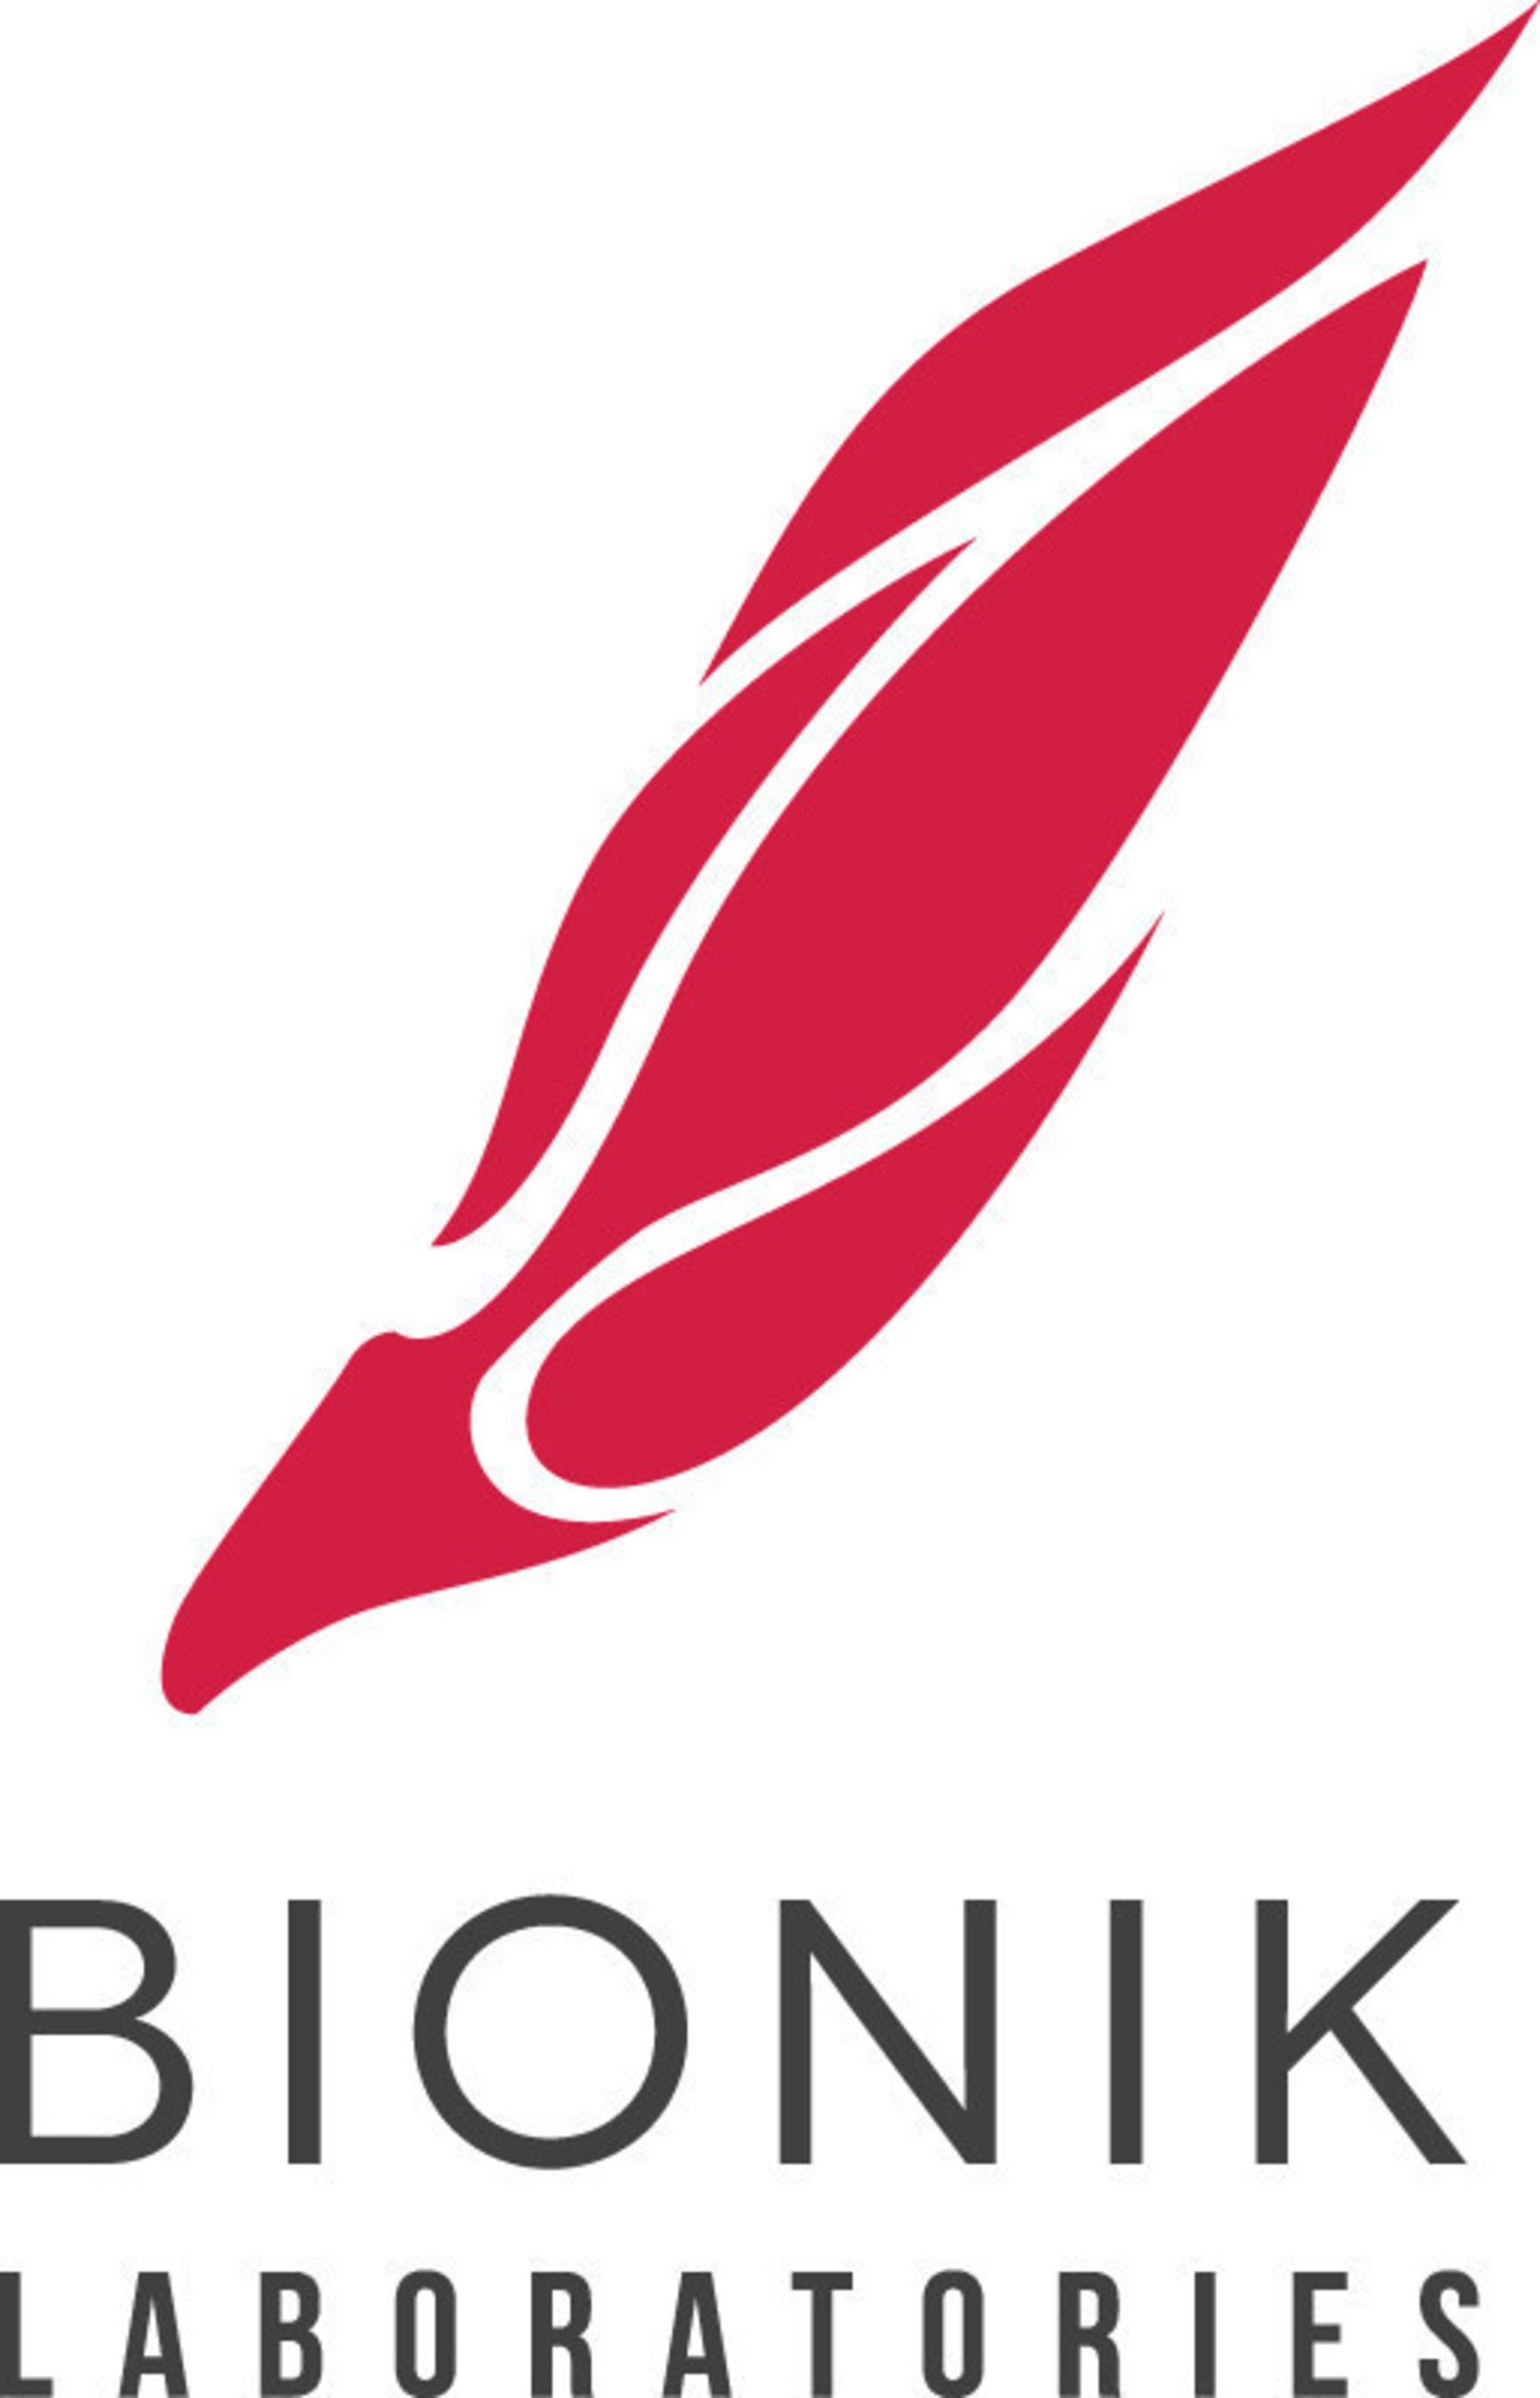 Bionik Laboratories Corp. logo